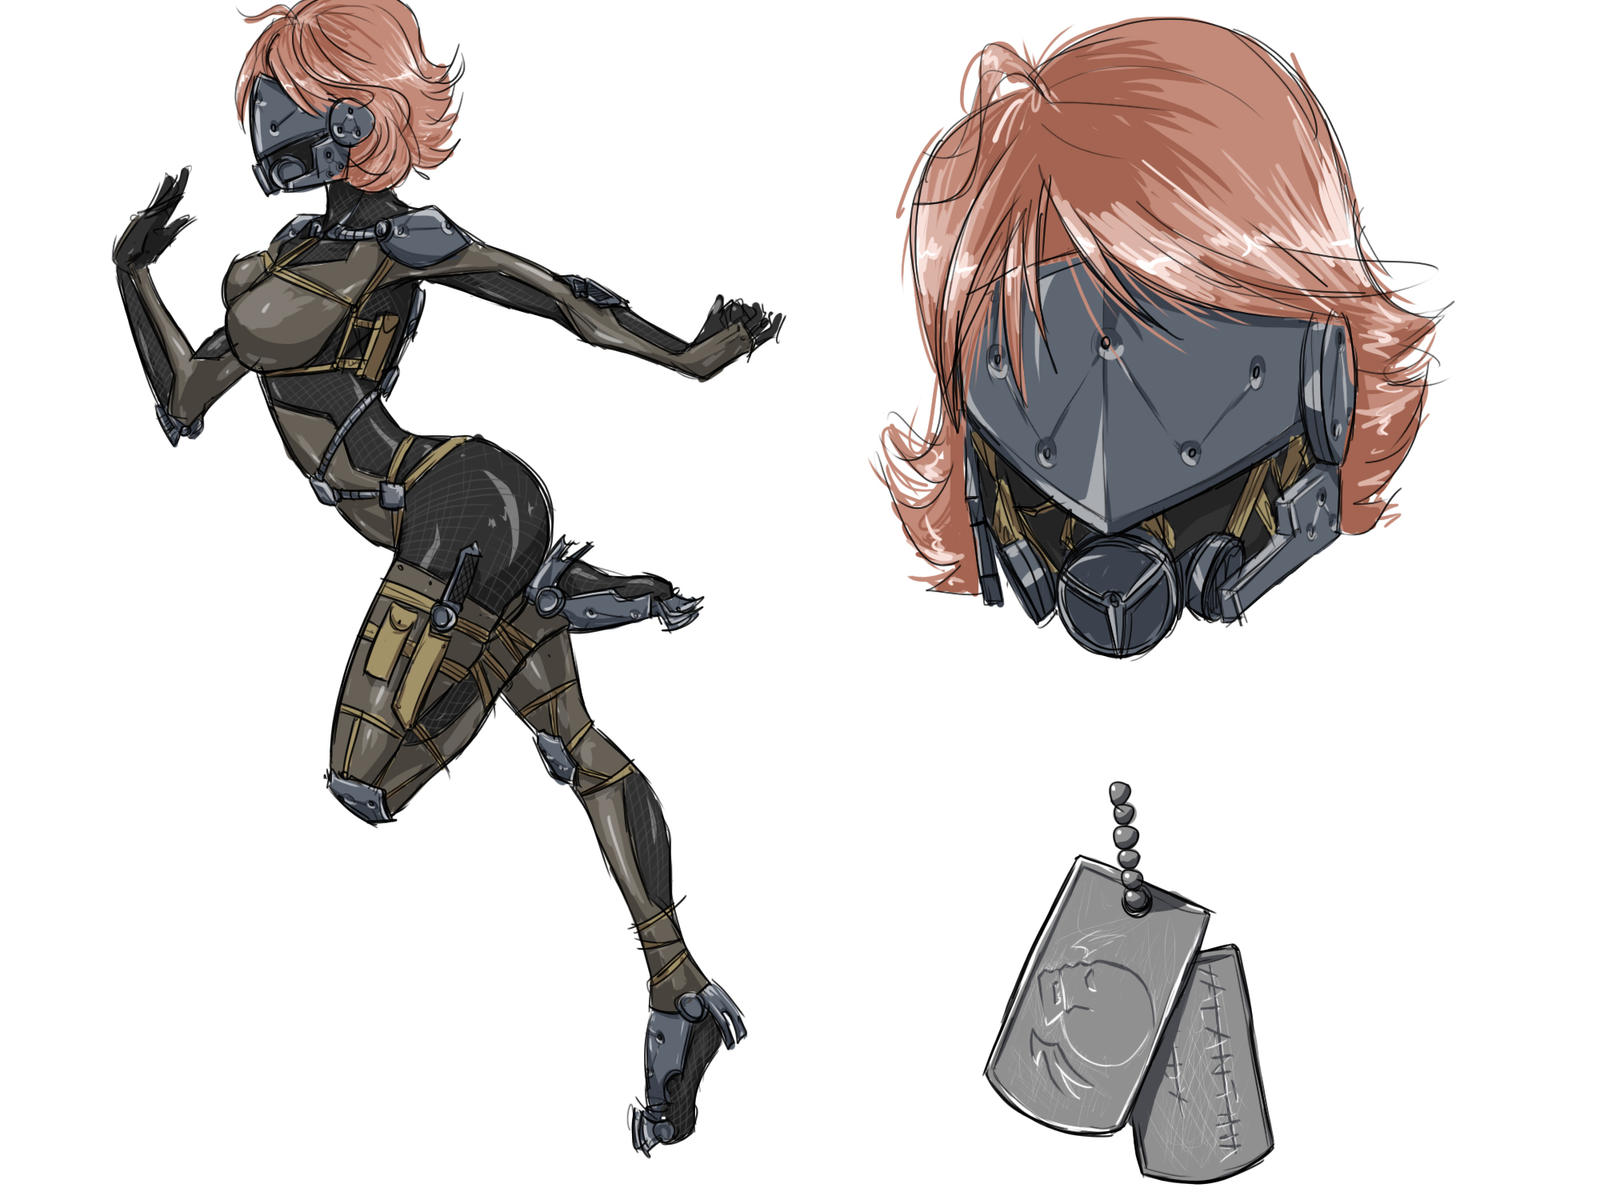 Female Cyborg (MGS Style) by KuHeilah on DeviantArt